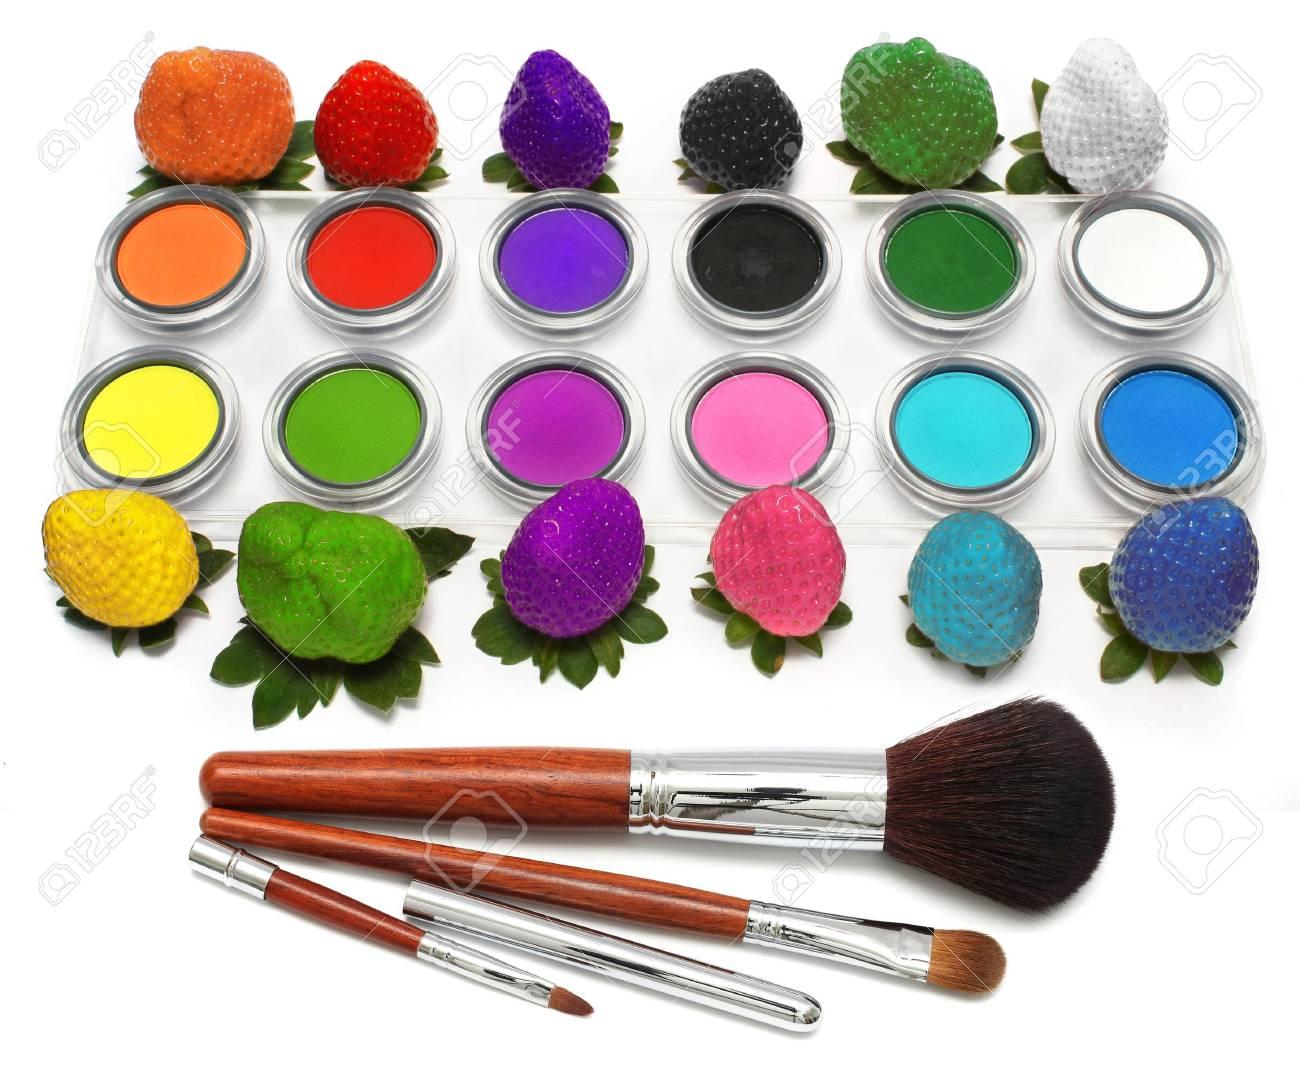 Colorful Strawberry, eyeshadow and few blusher on white background. - 3024638